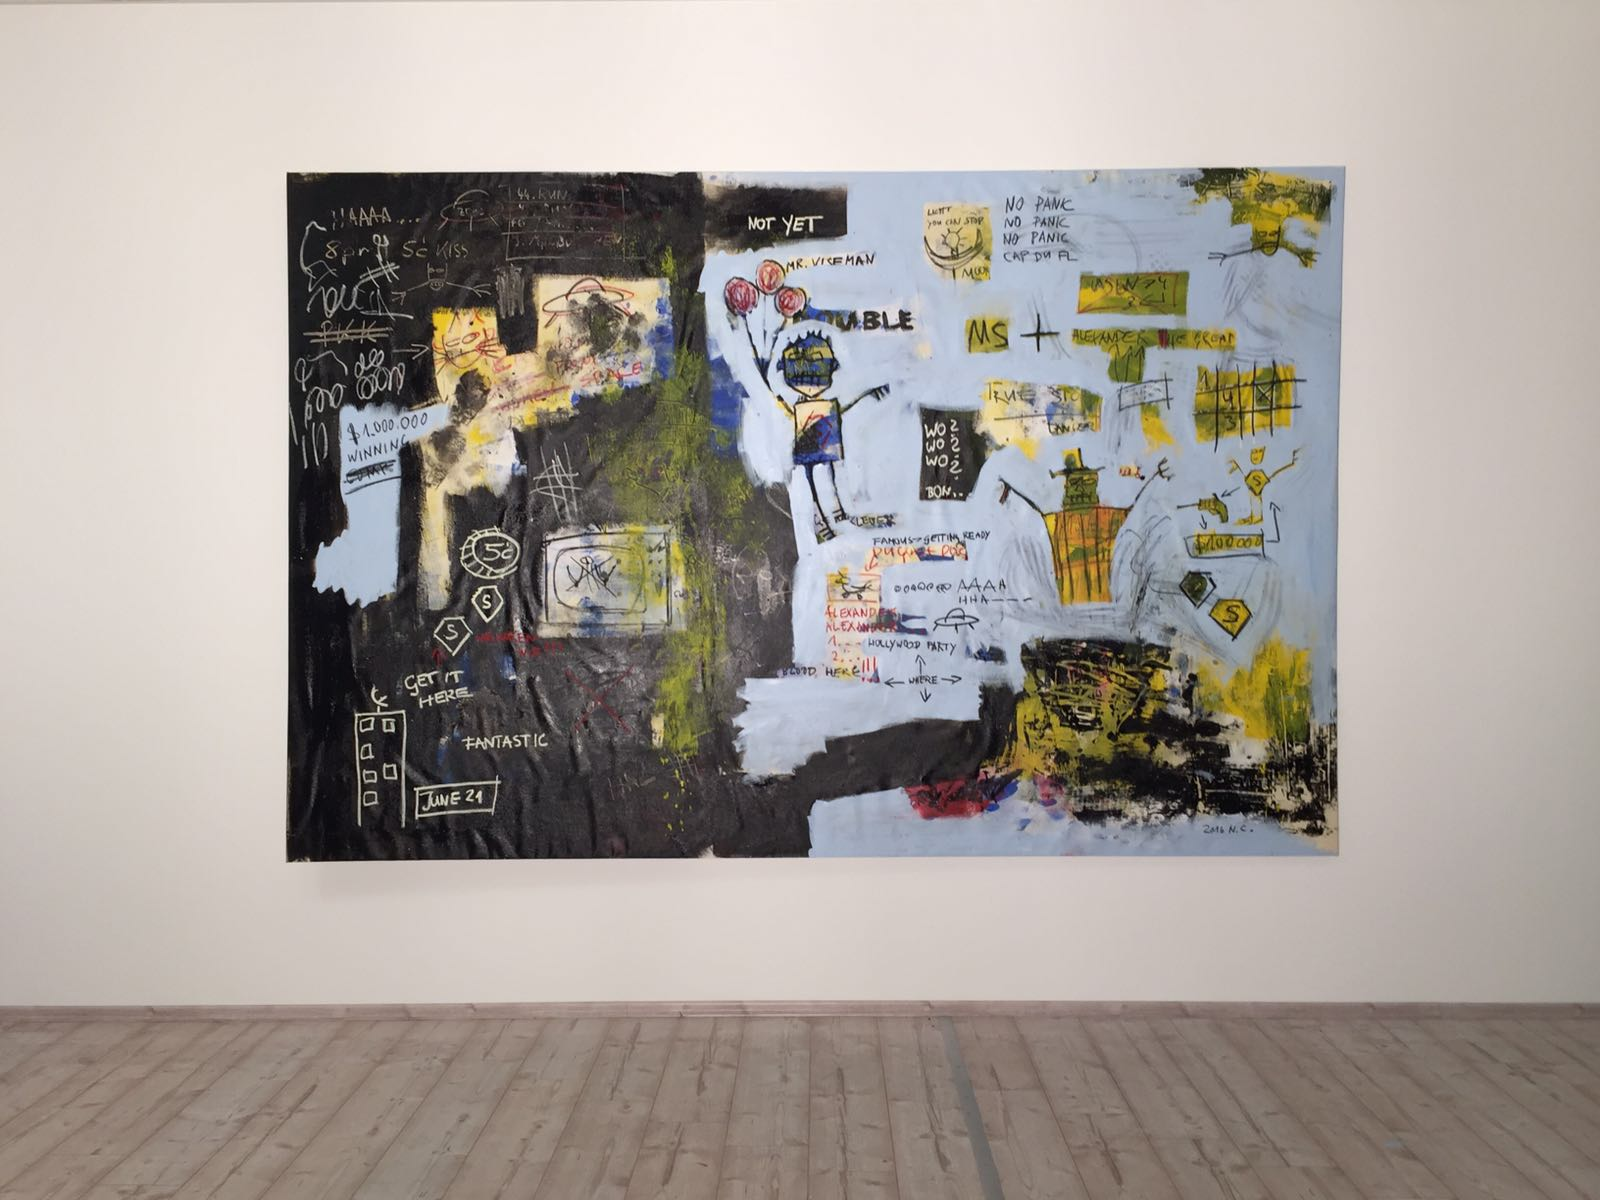 Niclas Castello Vertreibung Aus Dem Paradies 2017 Galerie Schimming